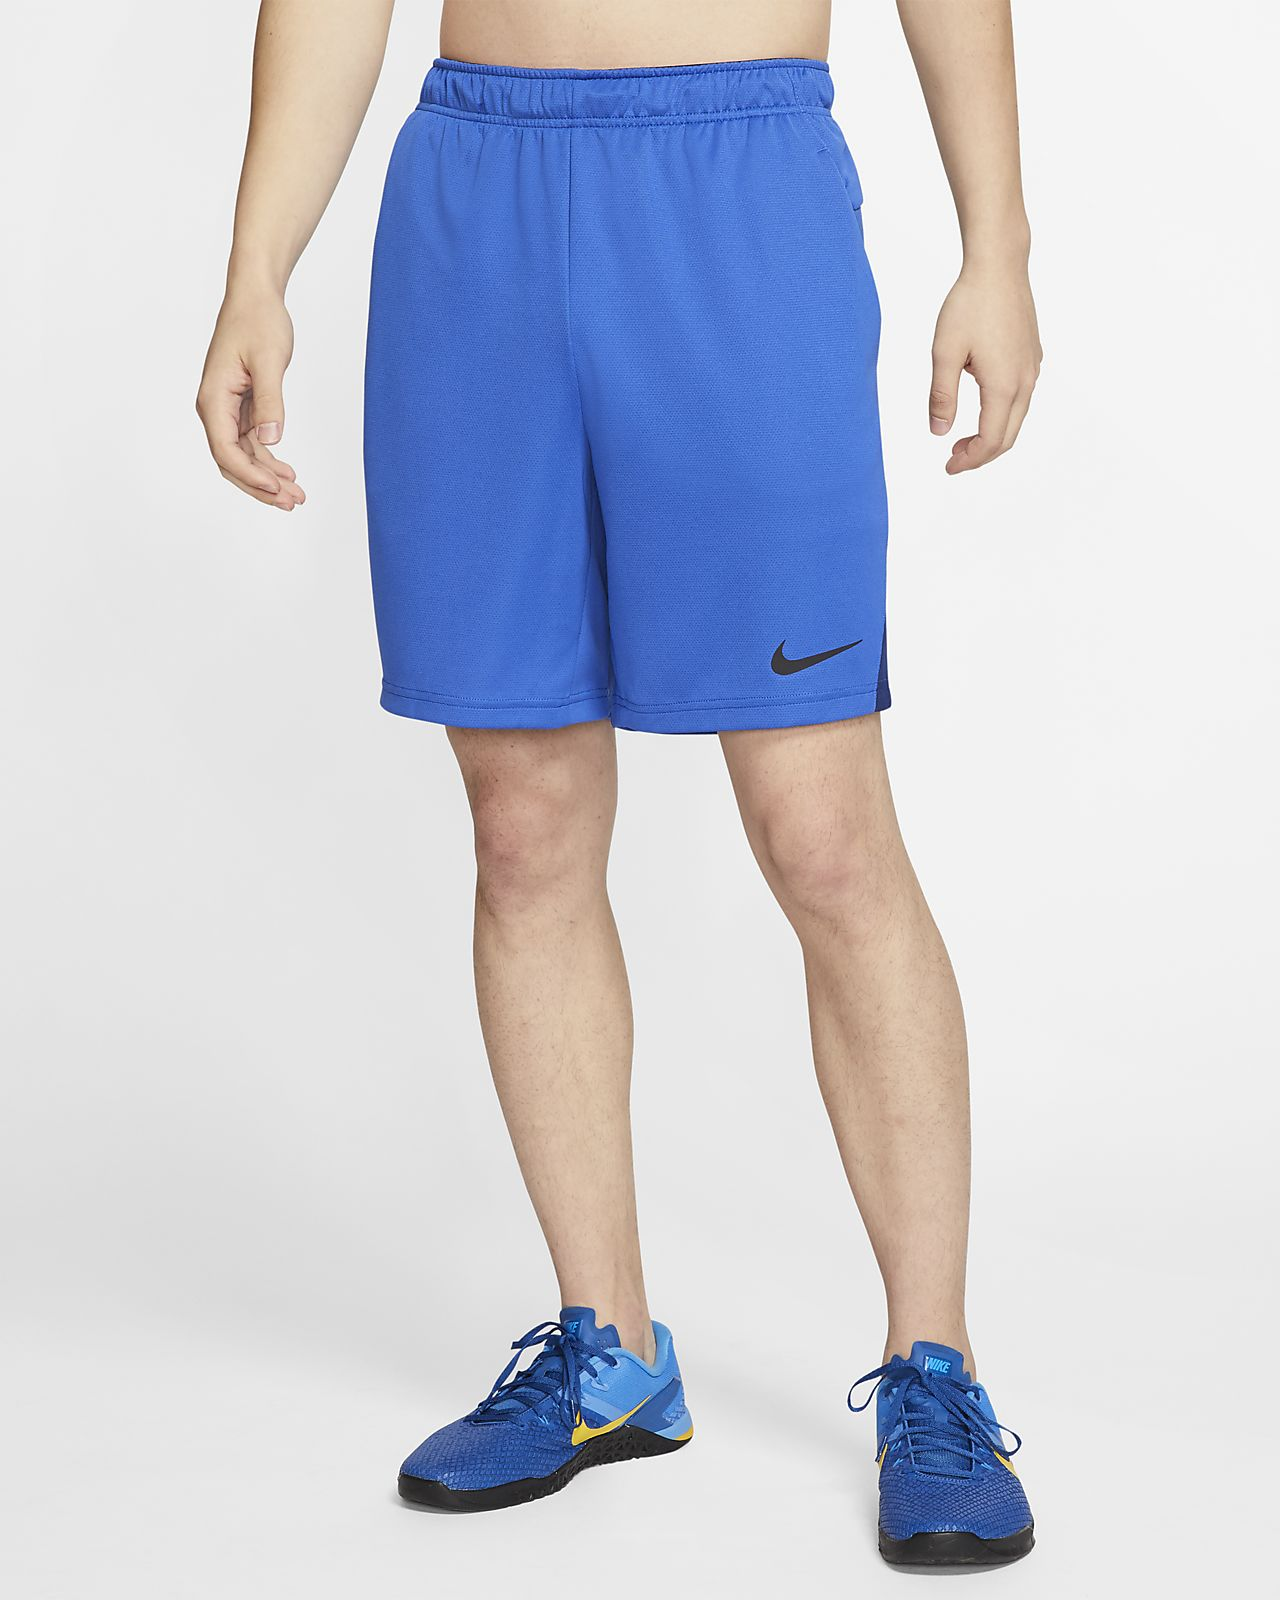 Nike Dri FIT Herren Trainingsshorts